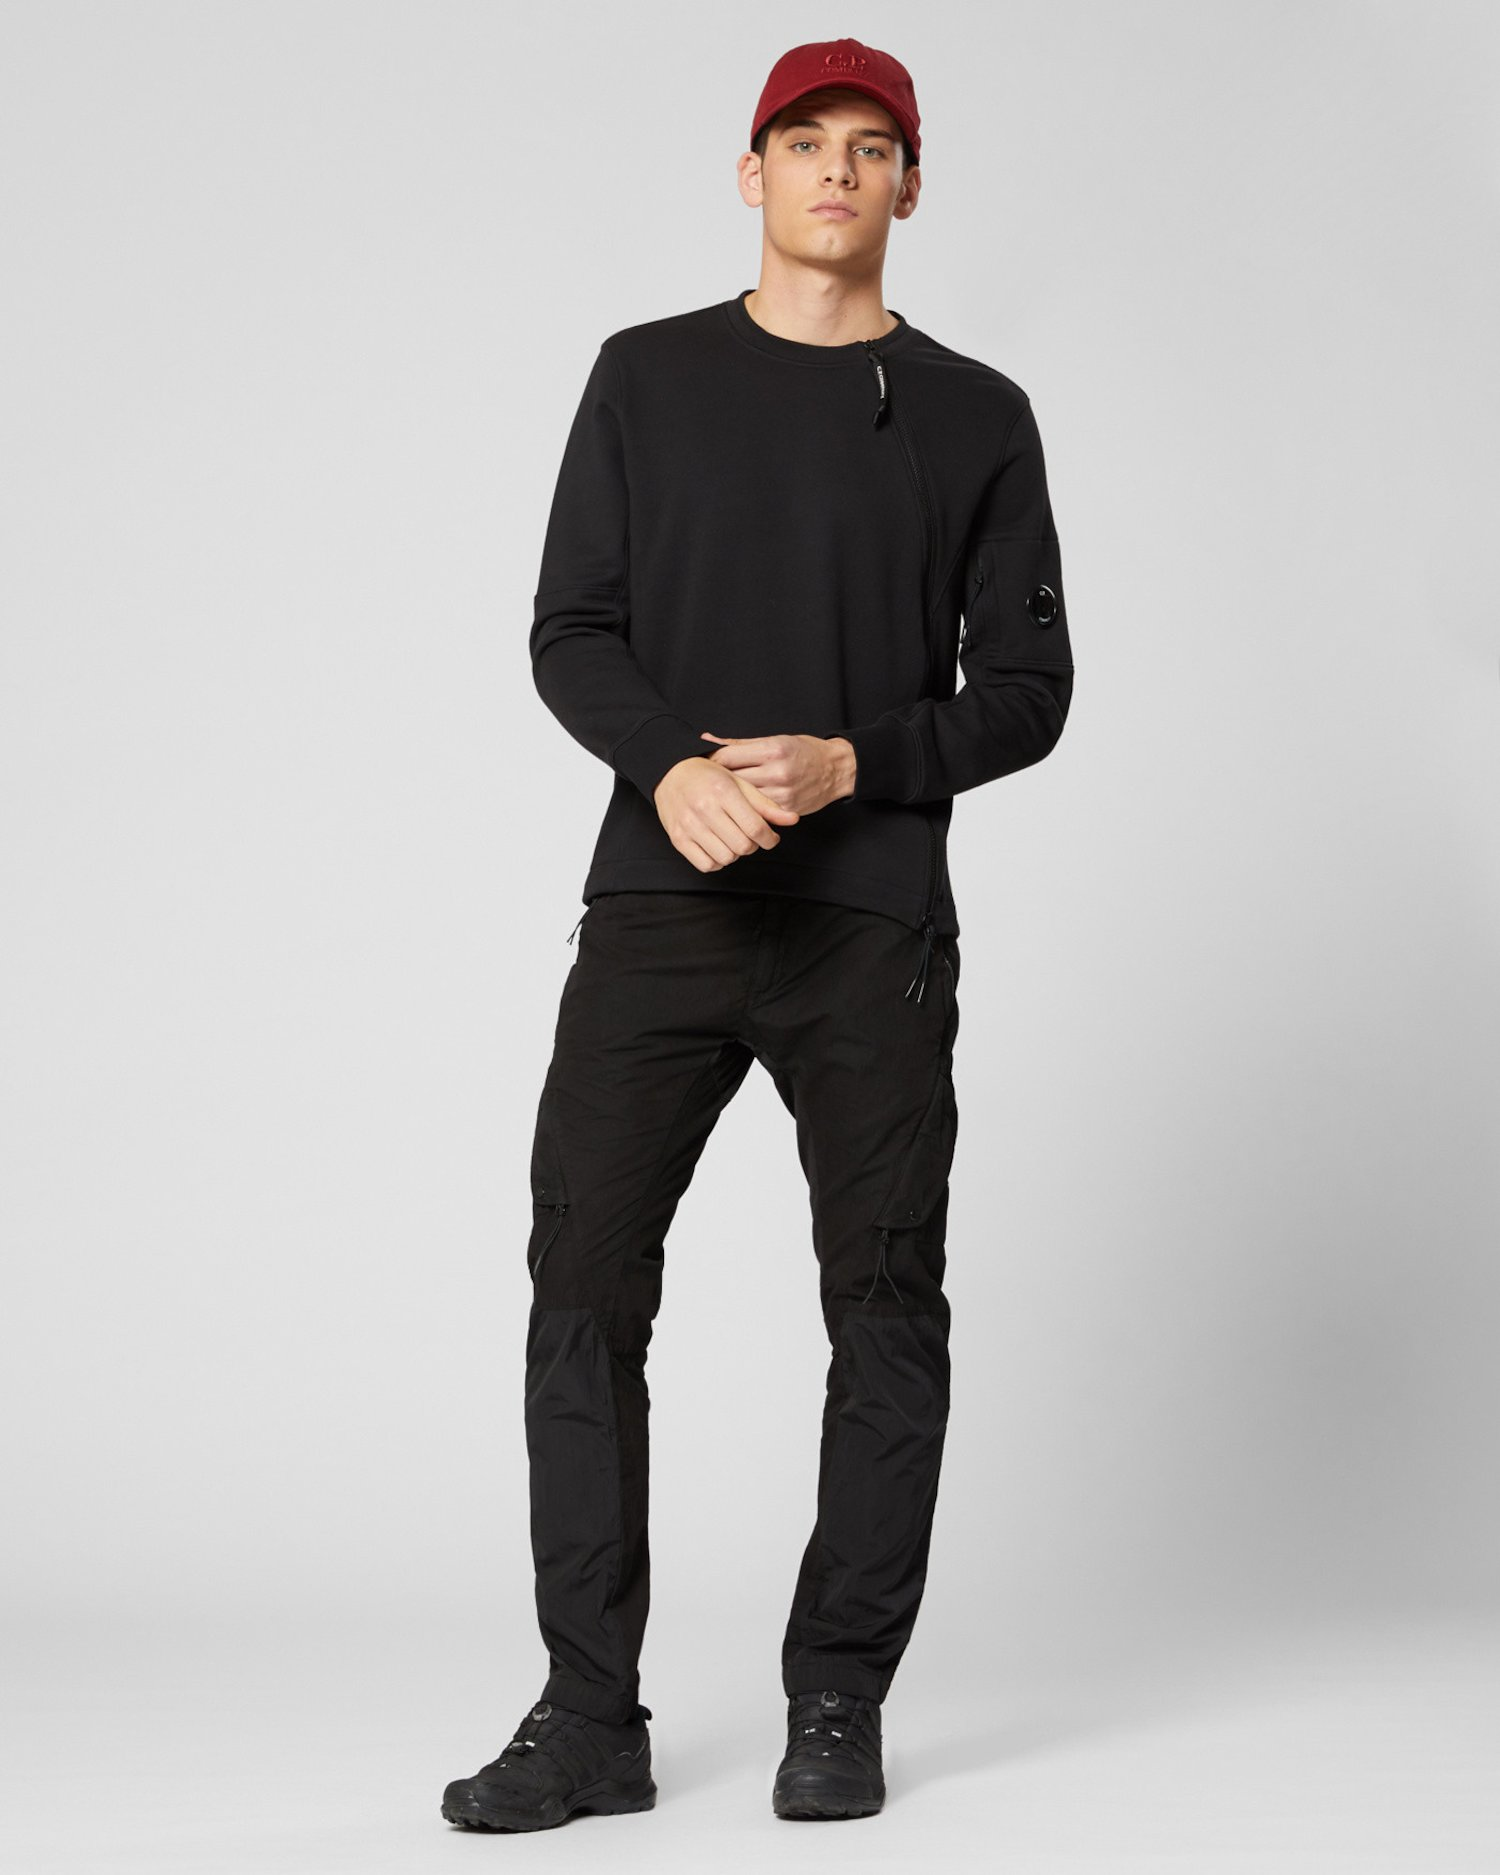 Diagonal Raised Fleece Asymmetric Zip Sweatshirt